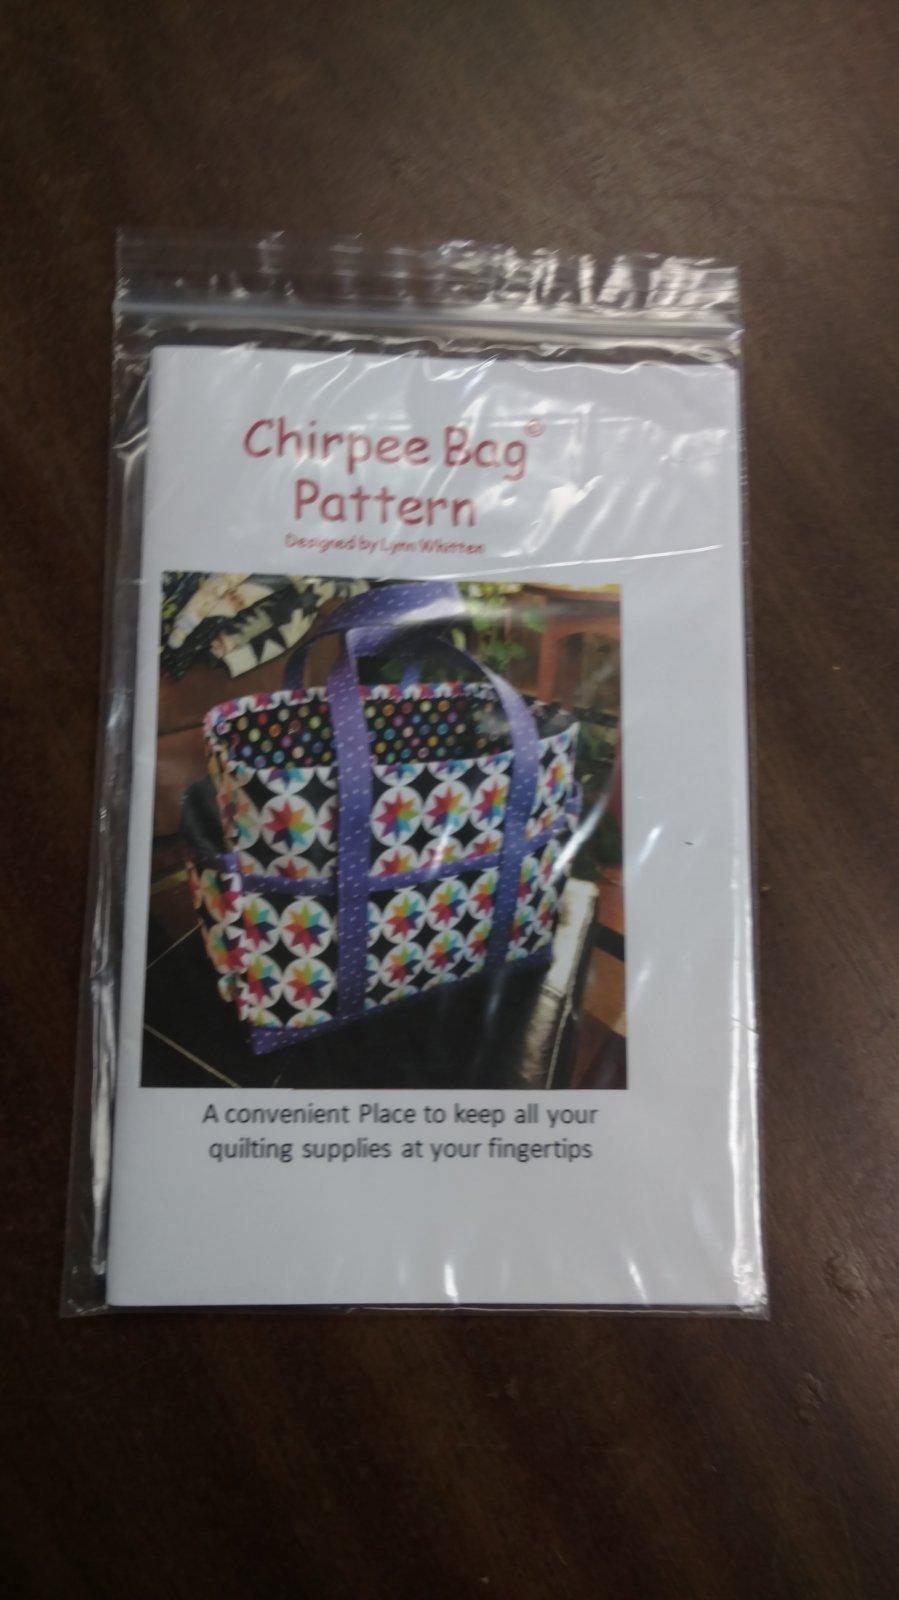 Chirpee Bag